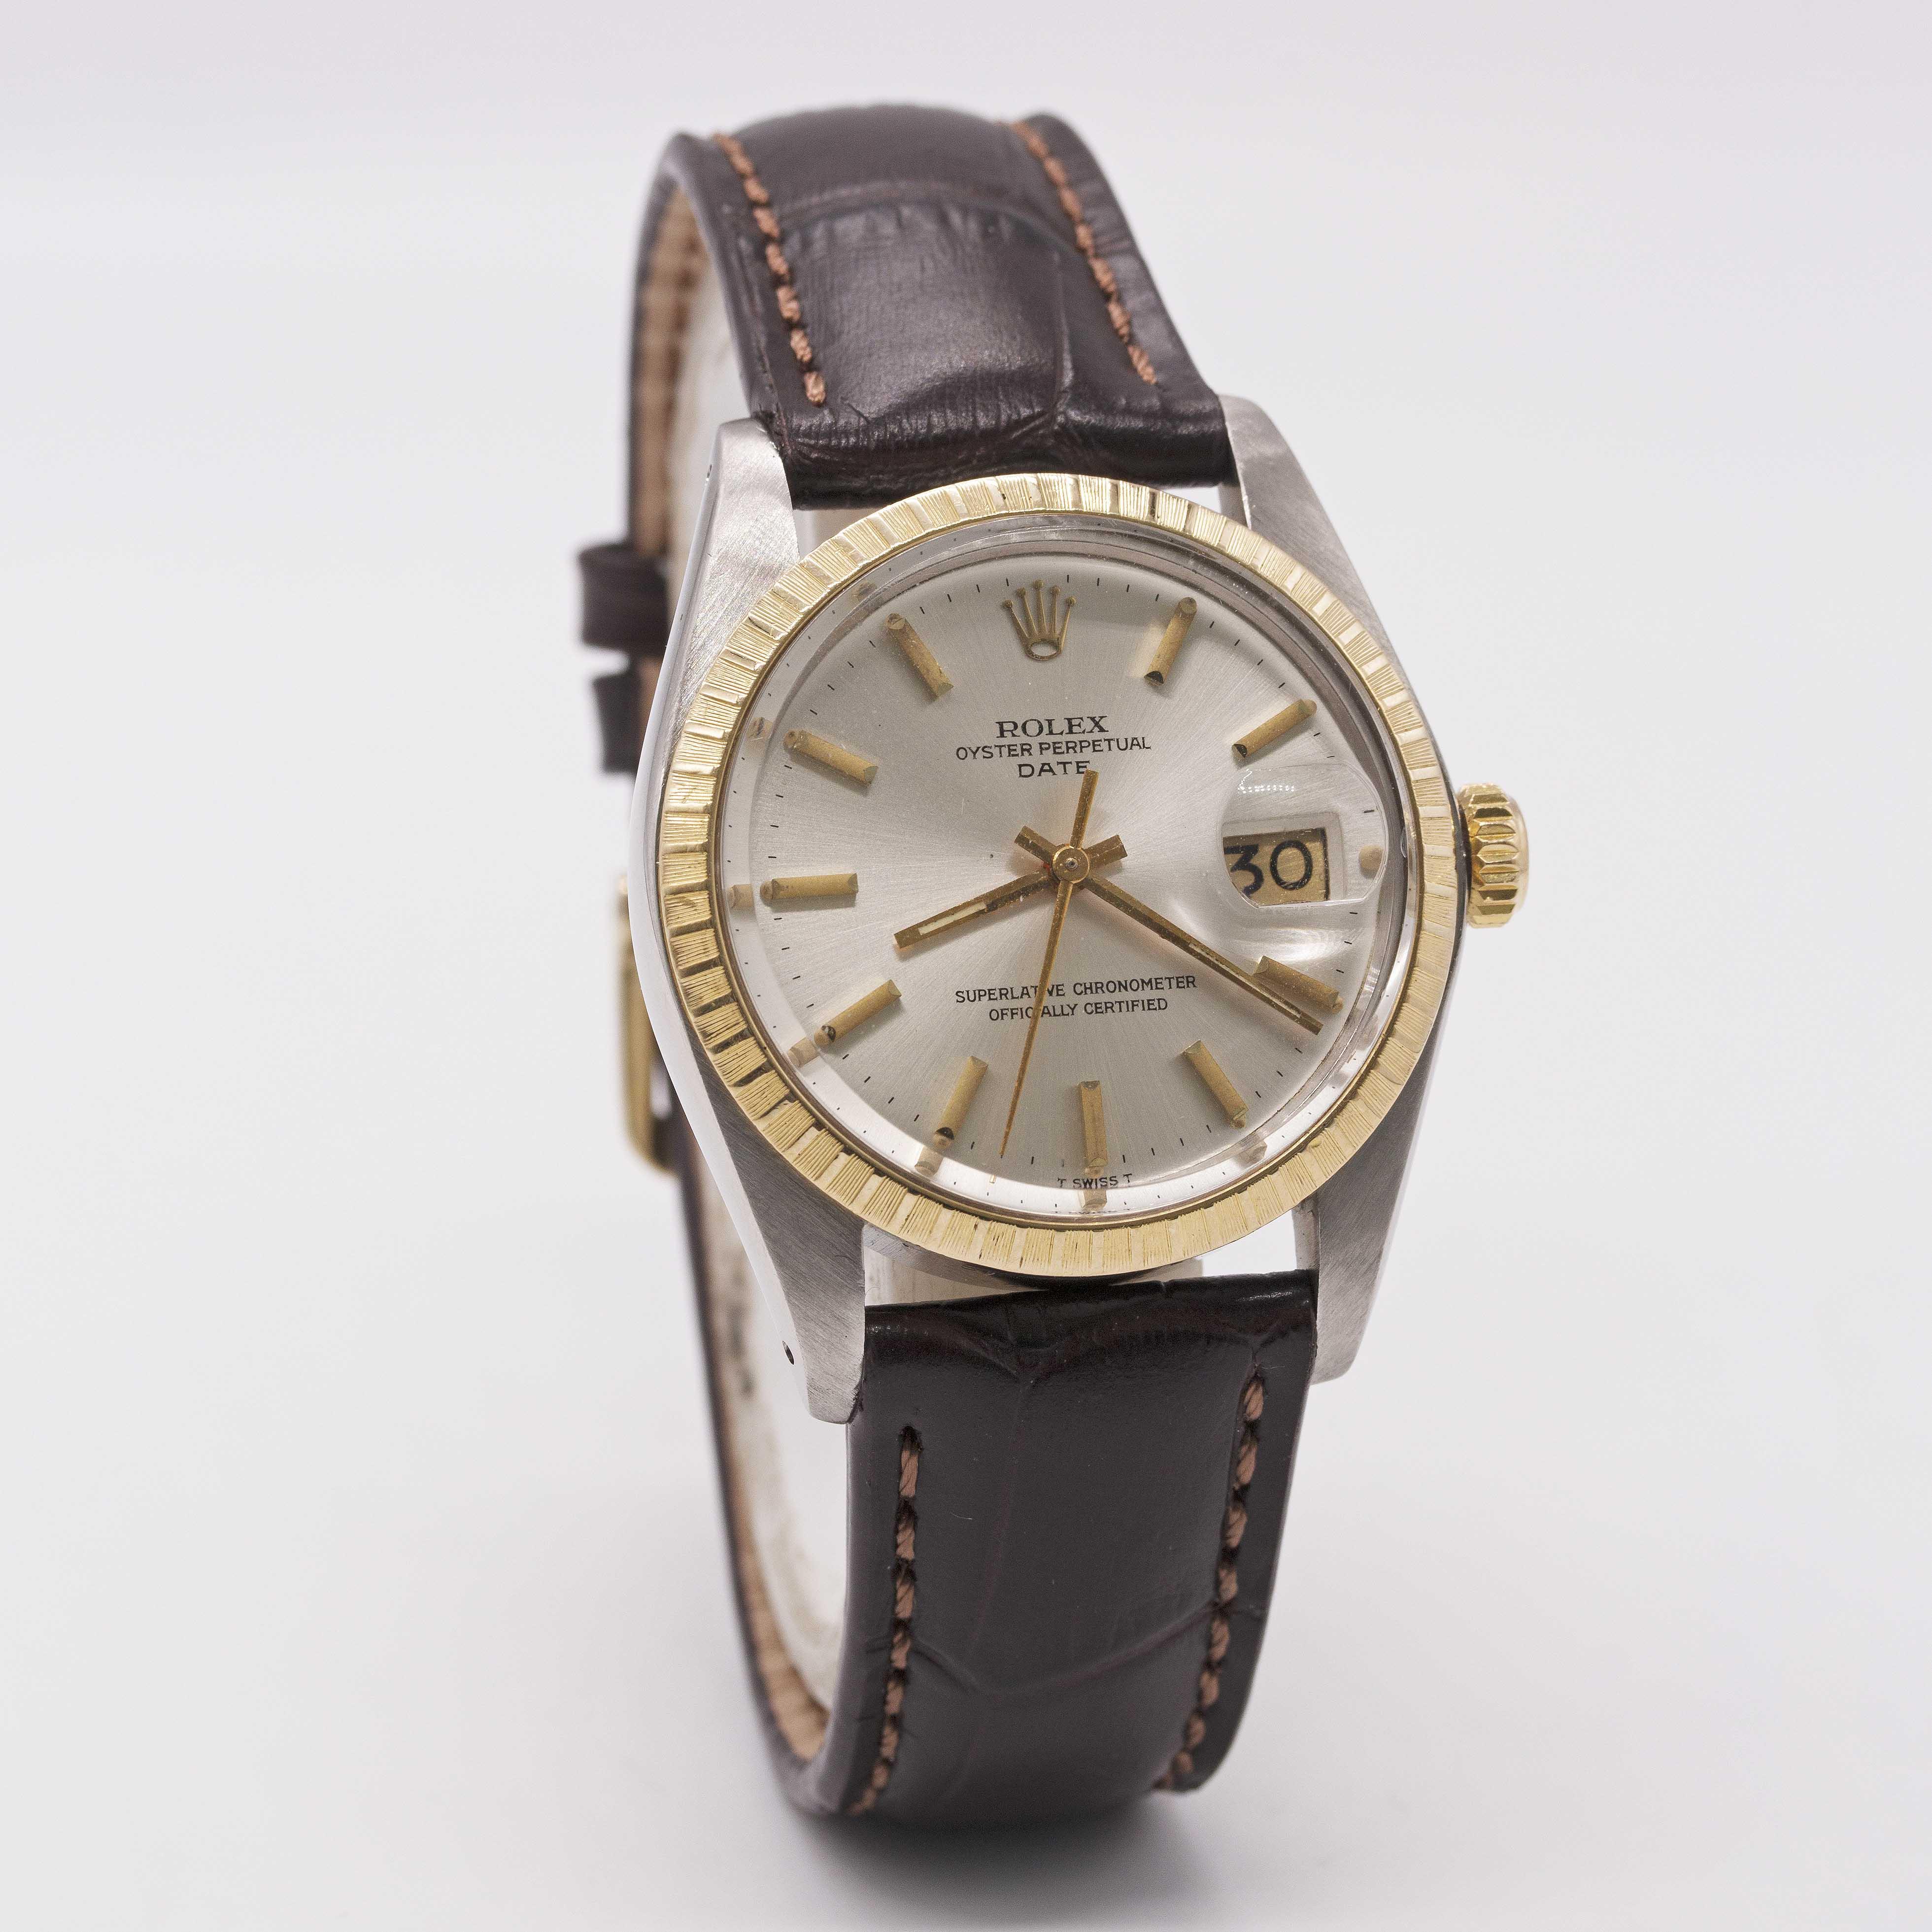 Lot 24 - A GENTLEMAN'S STEEL & GOLD ROLEX OYSTER PERPETUAL DATE WRIST WATCH CIRCA 1980, REF. 1505 Movement: